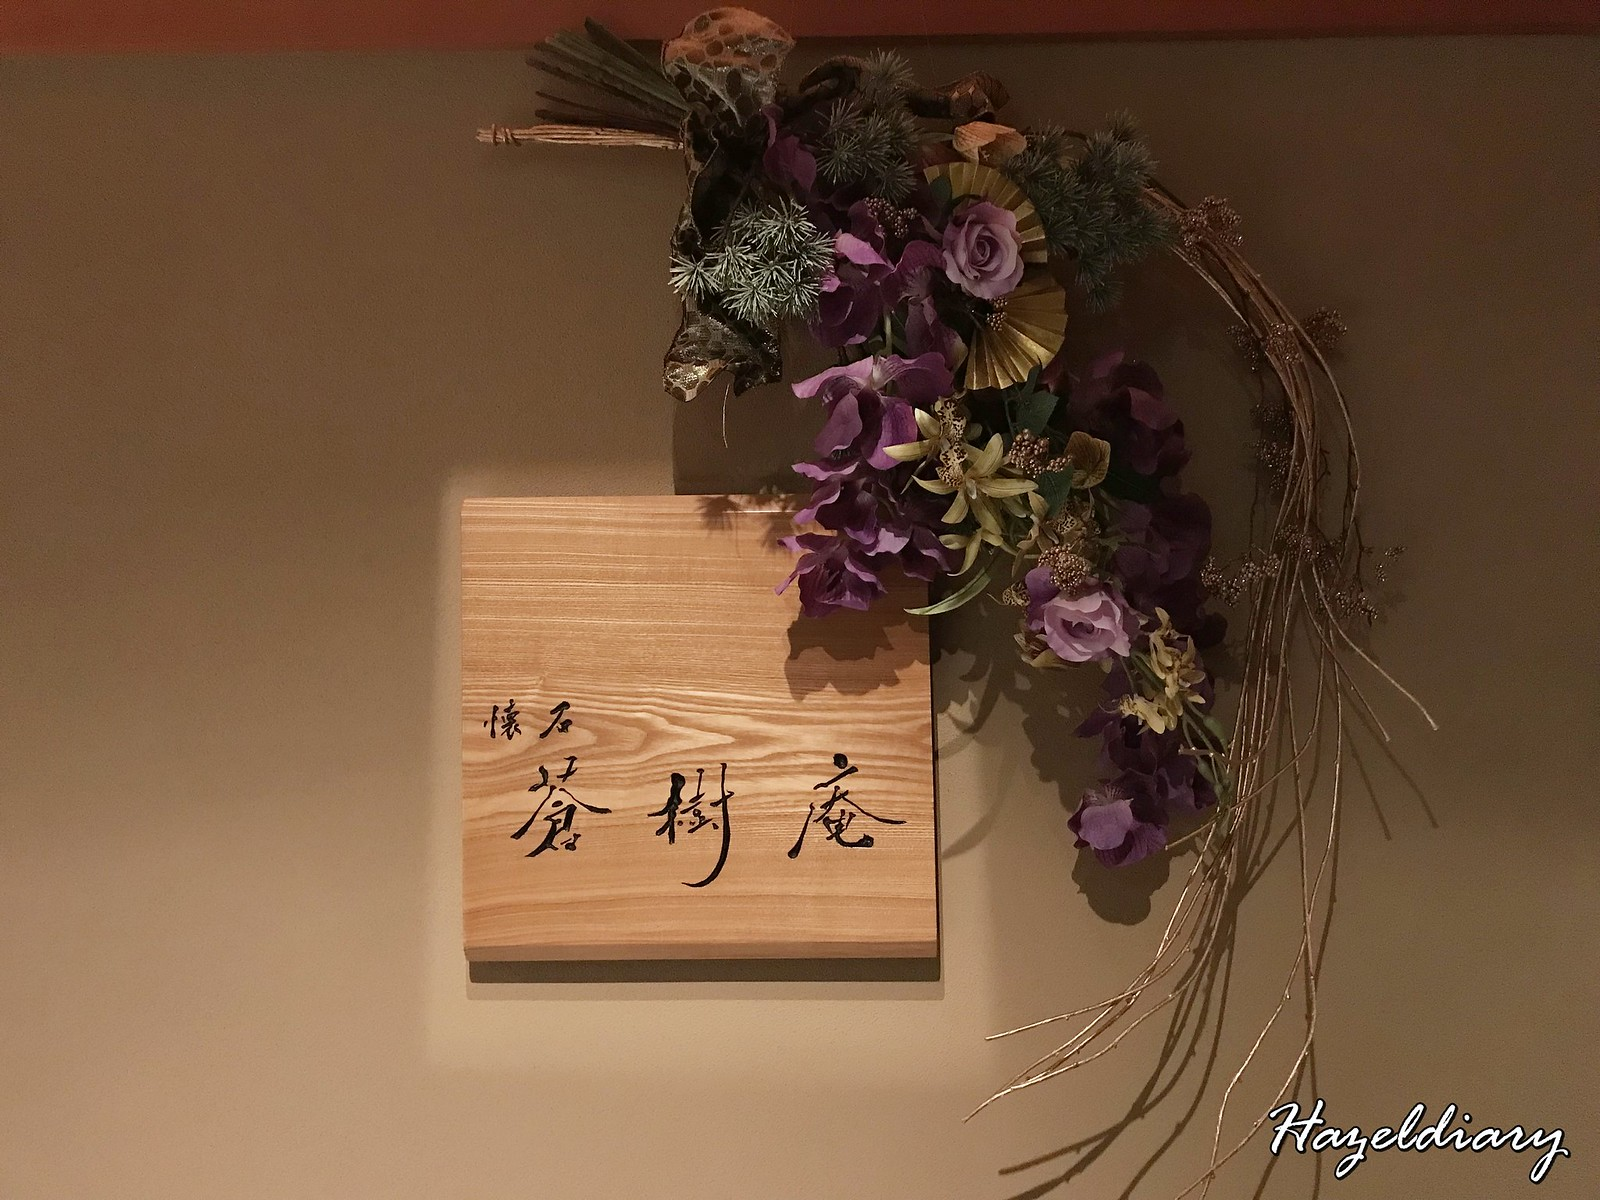 kaiseki soujuan keio plaza hotel tokyo-restaurant interior-1